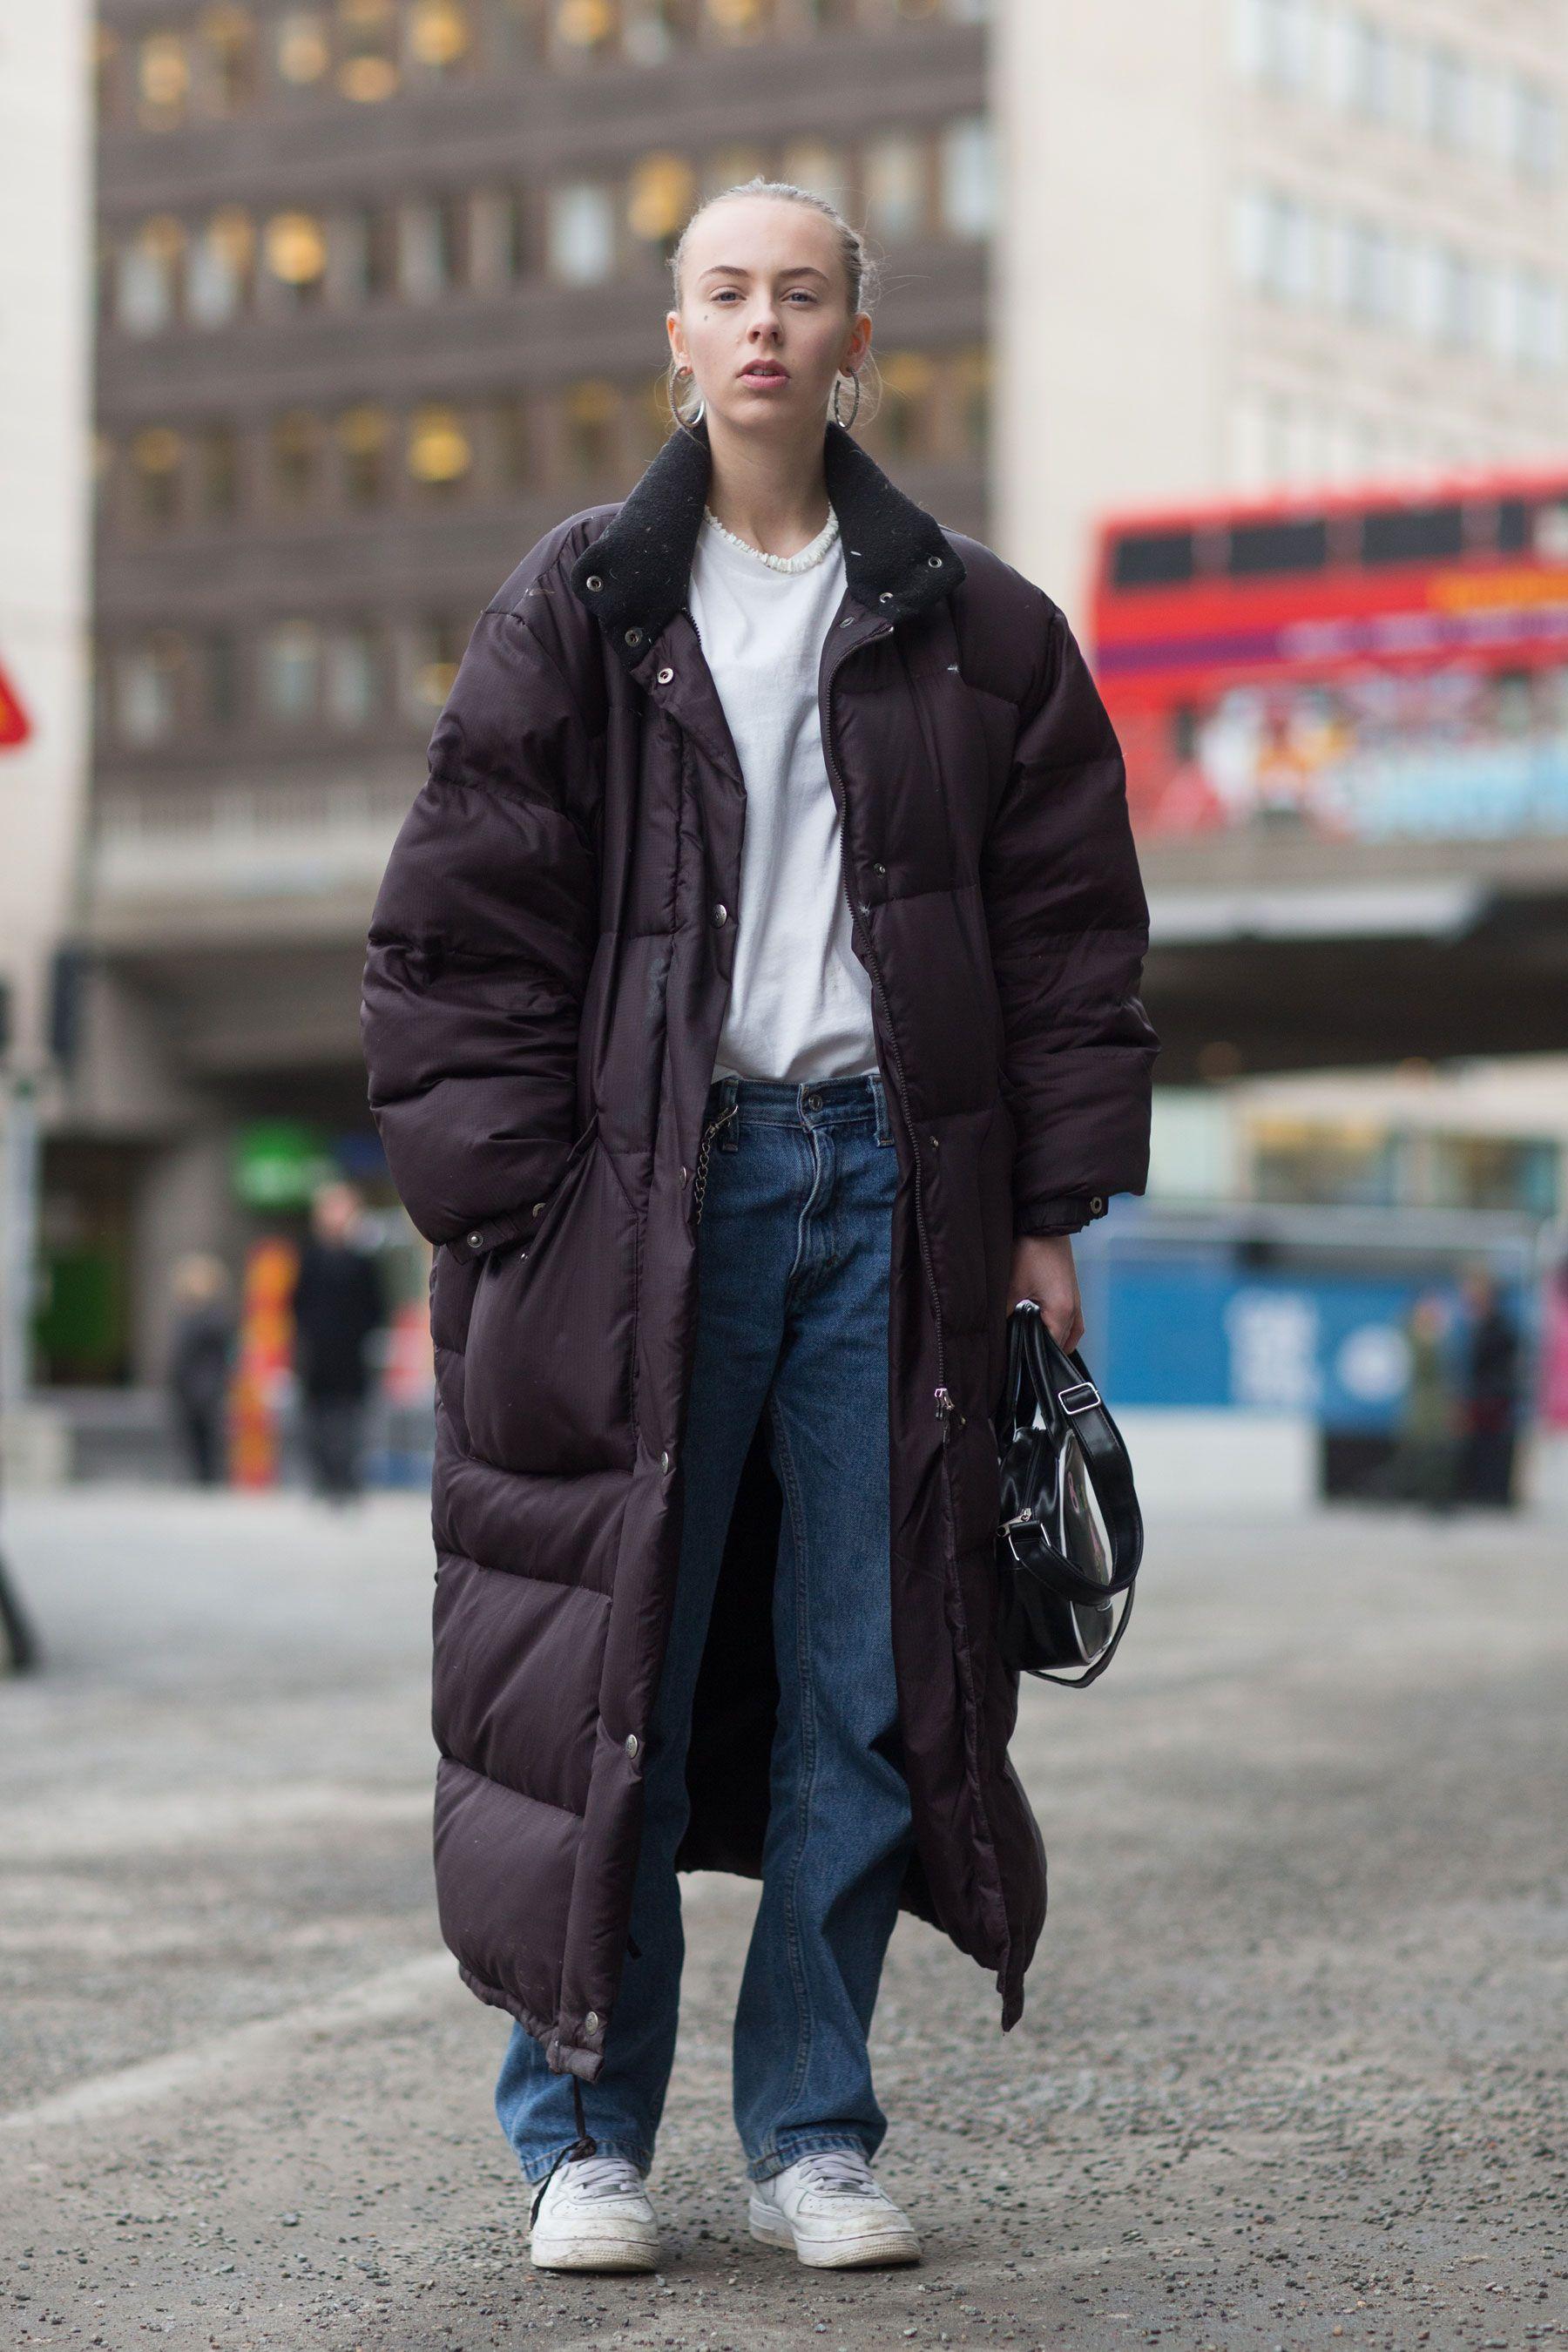 Stockholm Streetstyle Puffer Jacket Coat